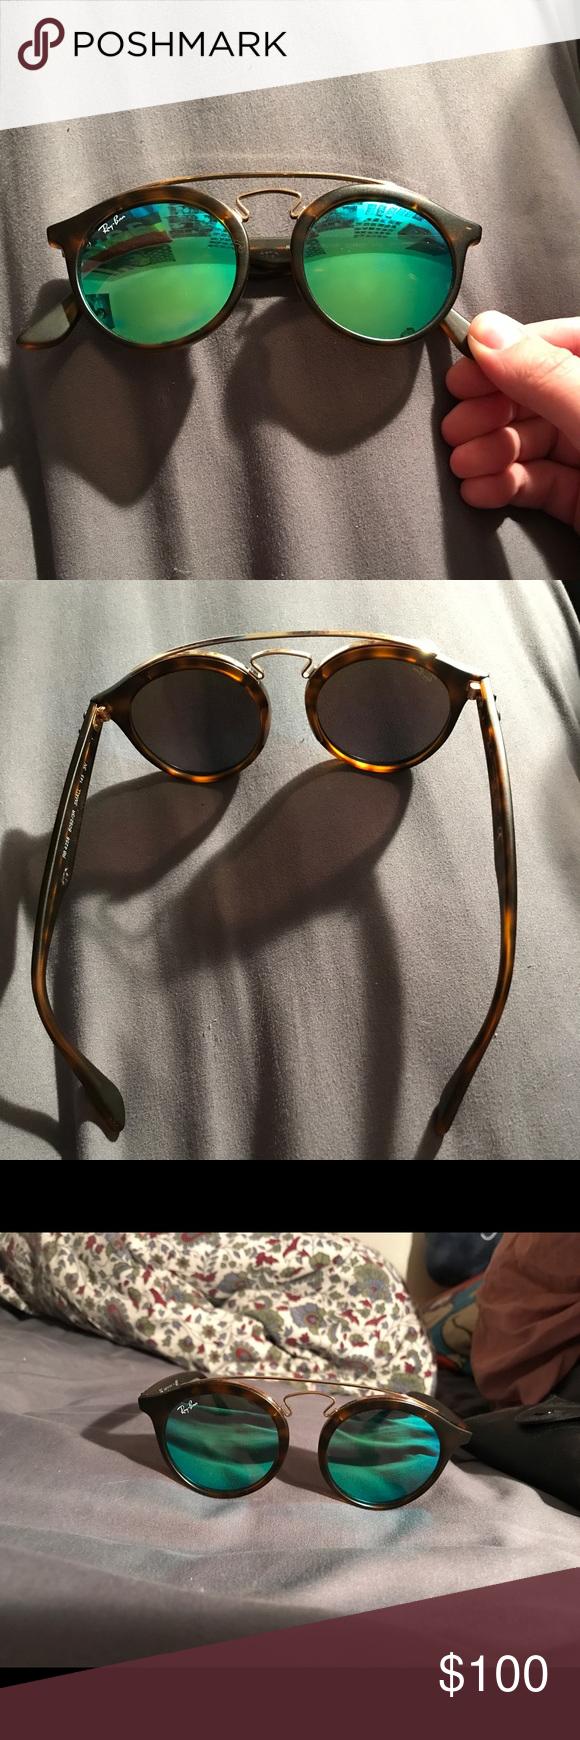 6da80262f8 Second Hand Ray Ban Sunglasses « One More Soul